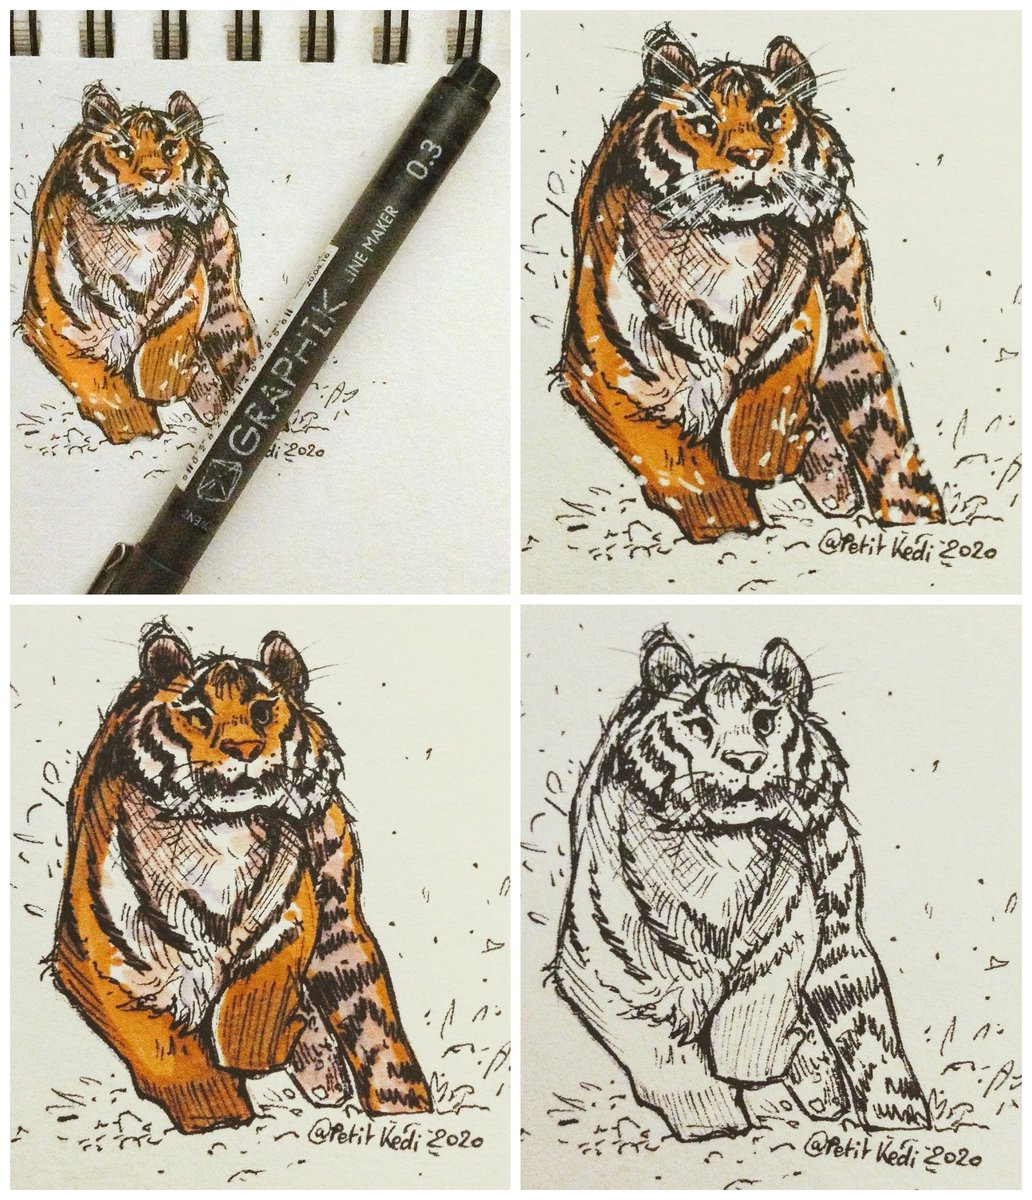 Quick Markers study of a tiger running snow  Check my project's artpage @TeamKokedi #art #study #tiger #markers #promarkers #snow #traditionalart #traditionaldrawing #animalstudy #feline #felinestudy #wildlife #studying #anatomy #animalanatomy #practice #doodle #sketch #drawingpic.twitter.com/EUL85uXXIZ